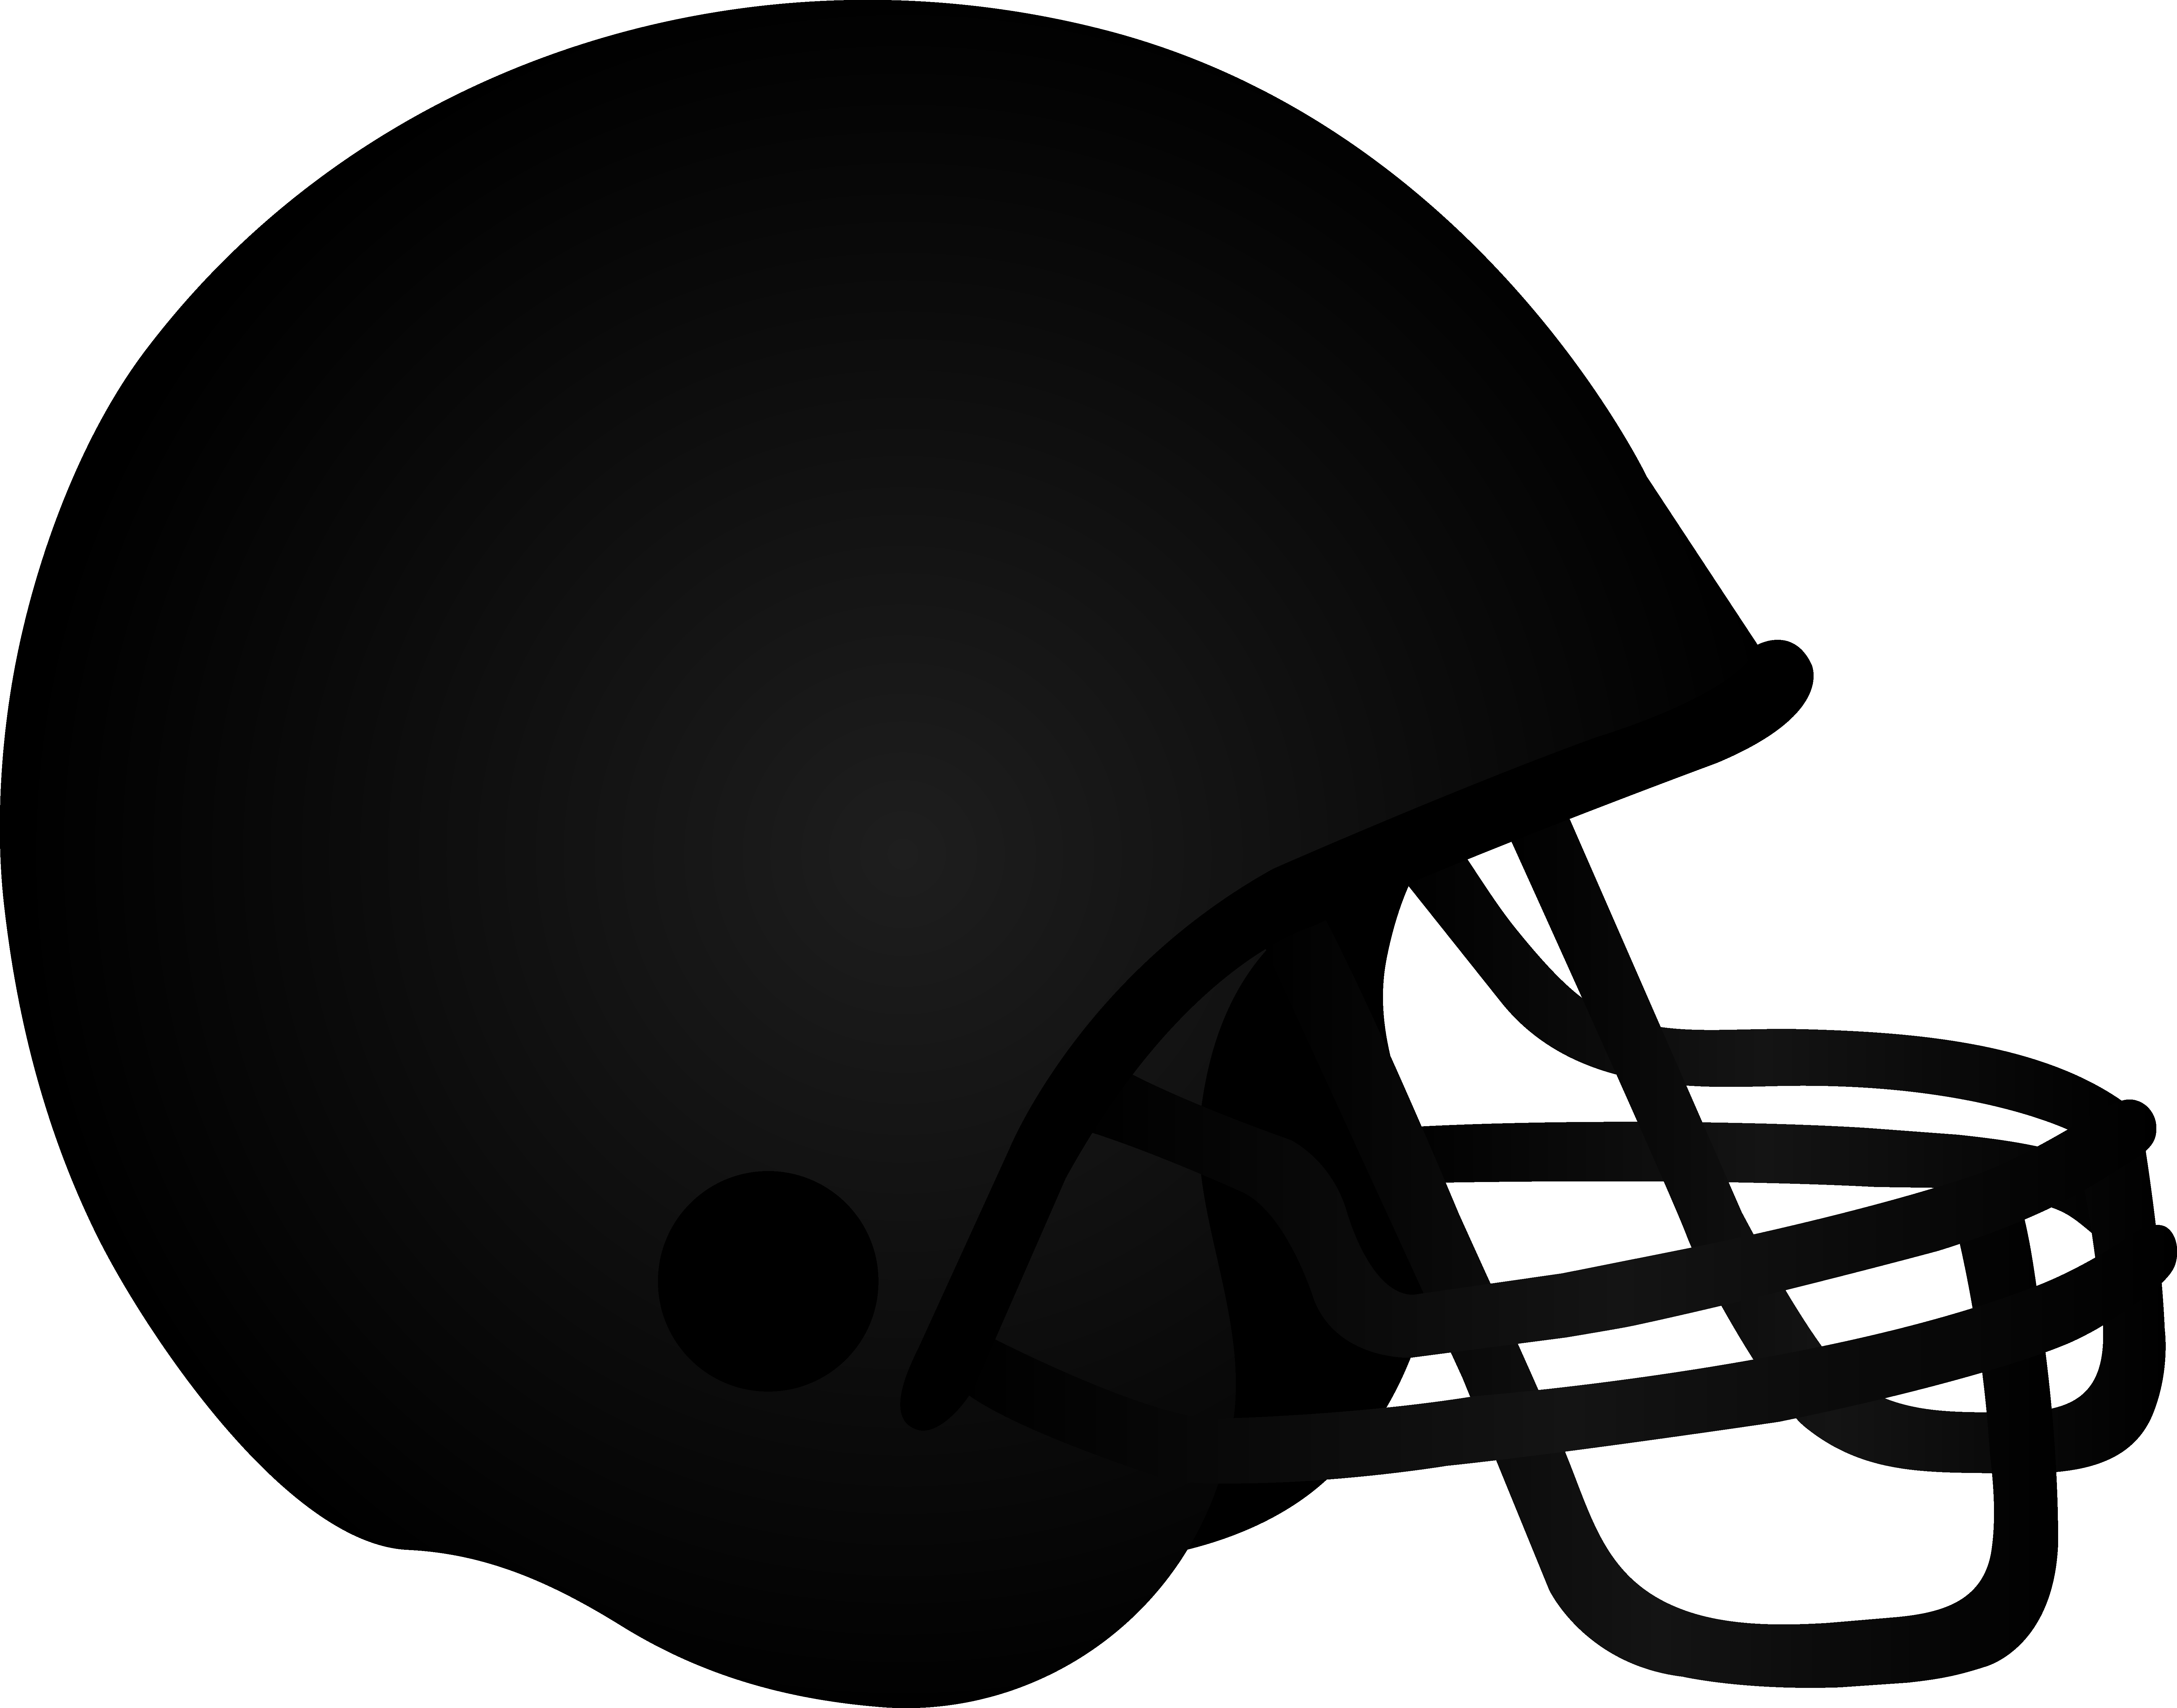 American Football Helmet PNG Image Football helmets